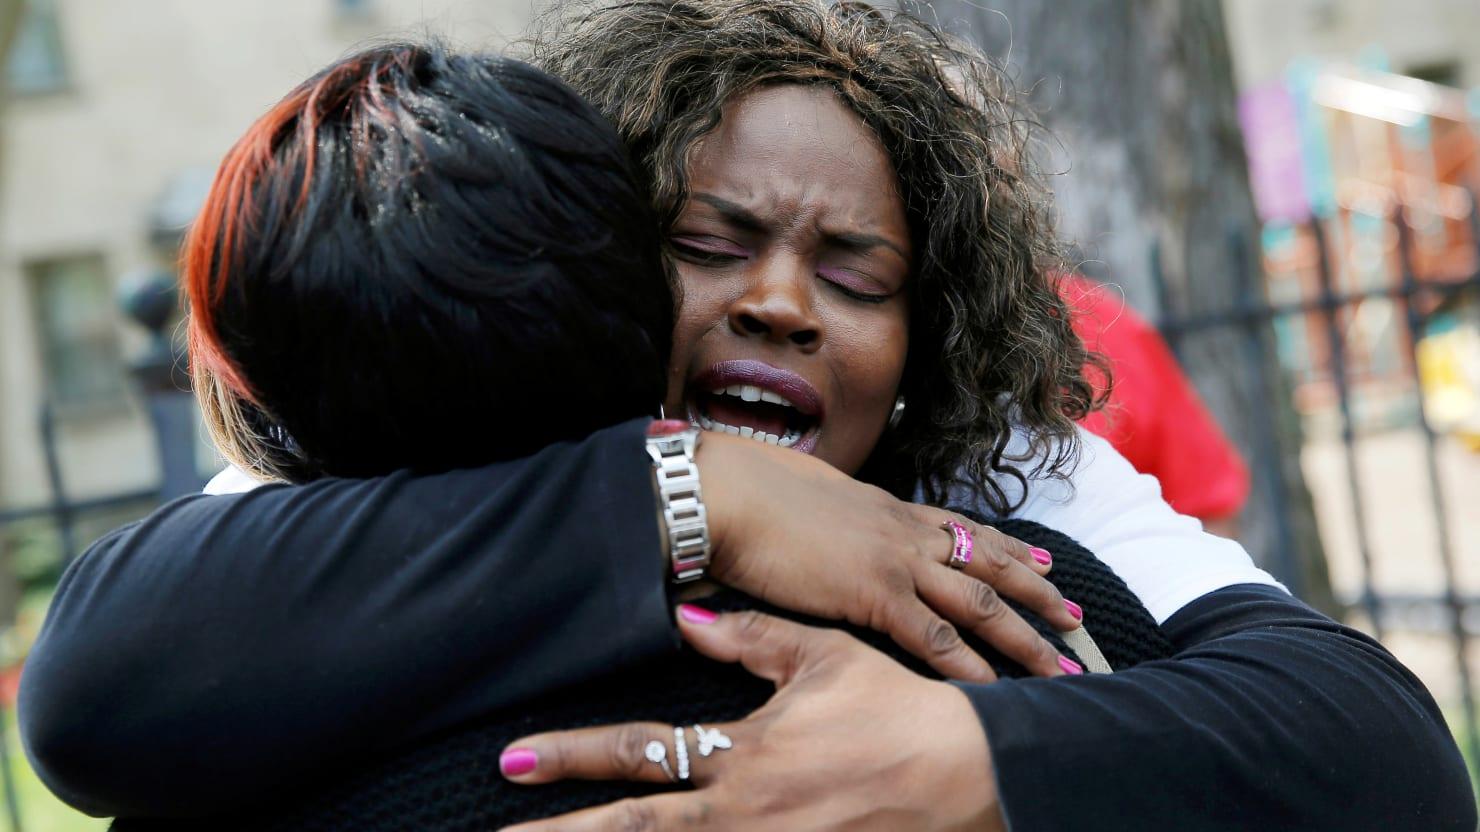 Chicago's Invisible Shooters Wreak Havoc